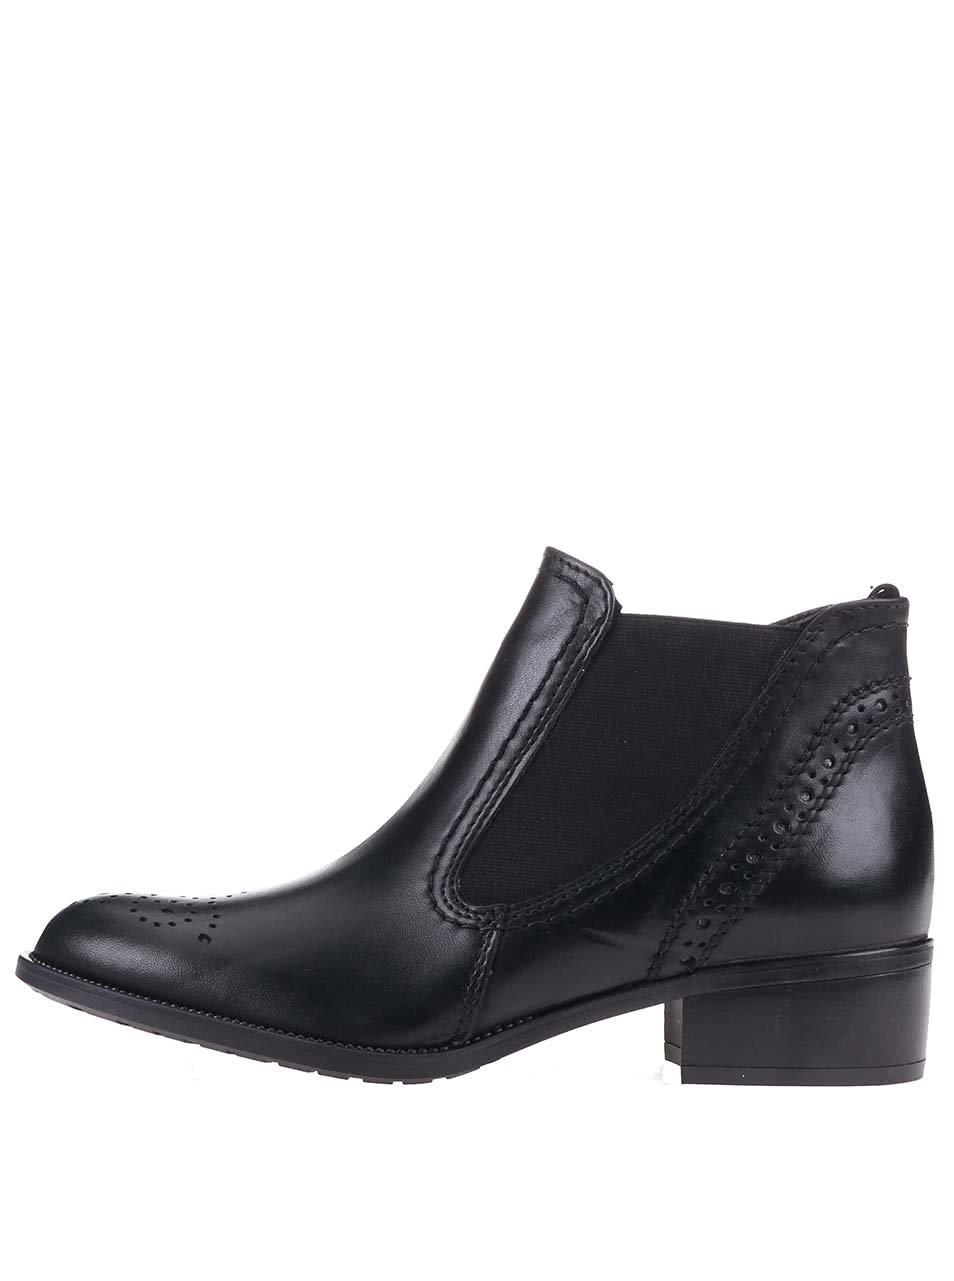 2fc3150cb89d0 Čierne dámske kožené členkové topánky Tamaris | ZOOT.sk